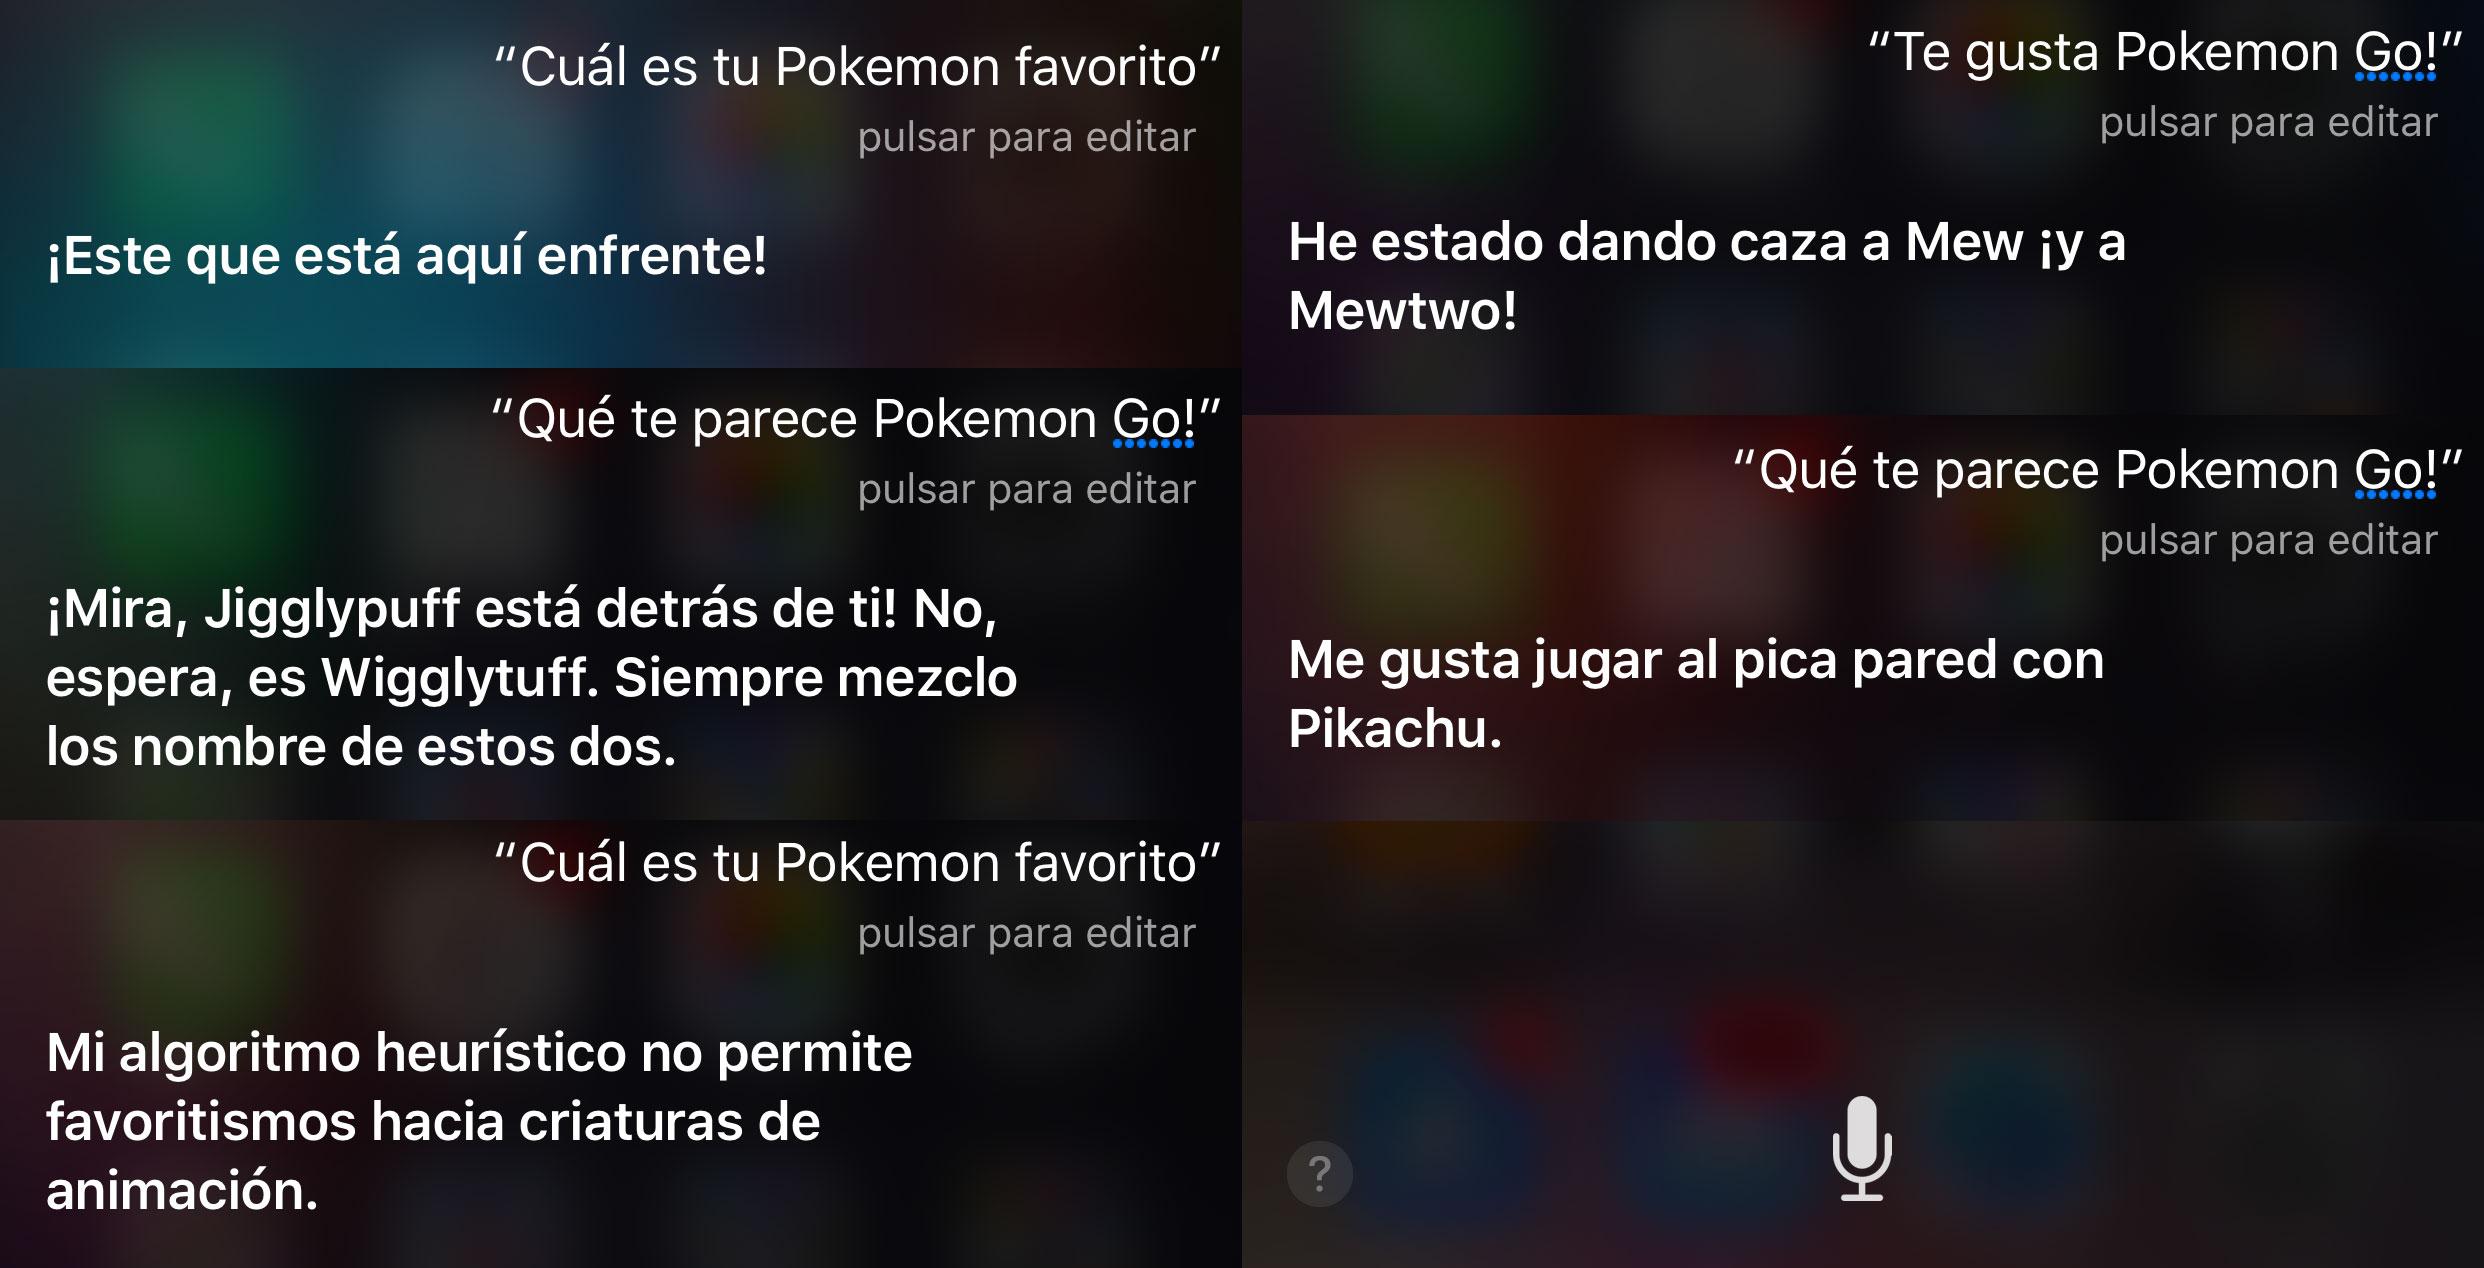 Siri contestando cosas divertidas sobre Pokémon Go